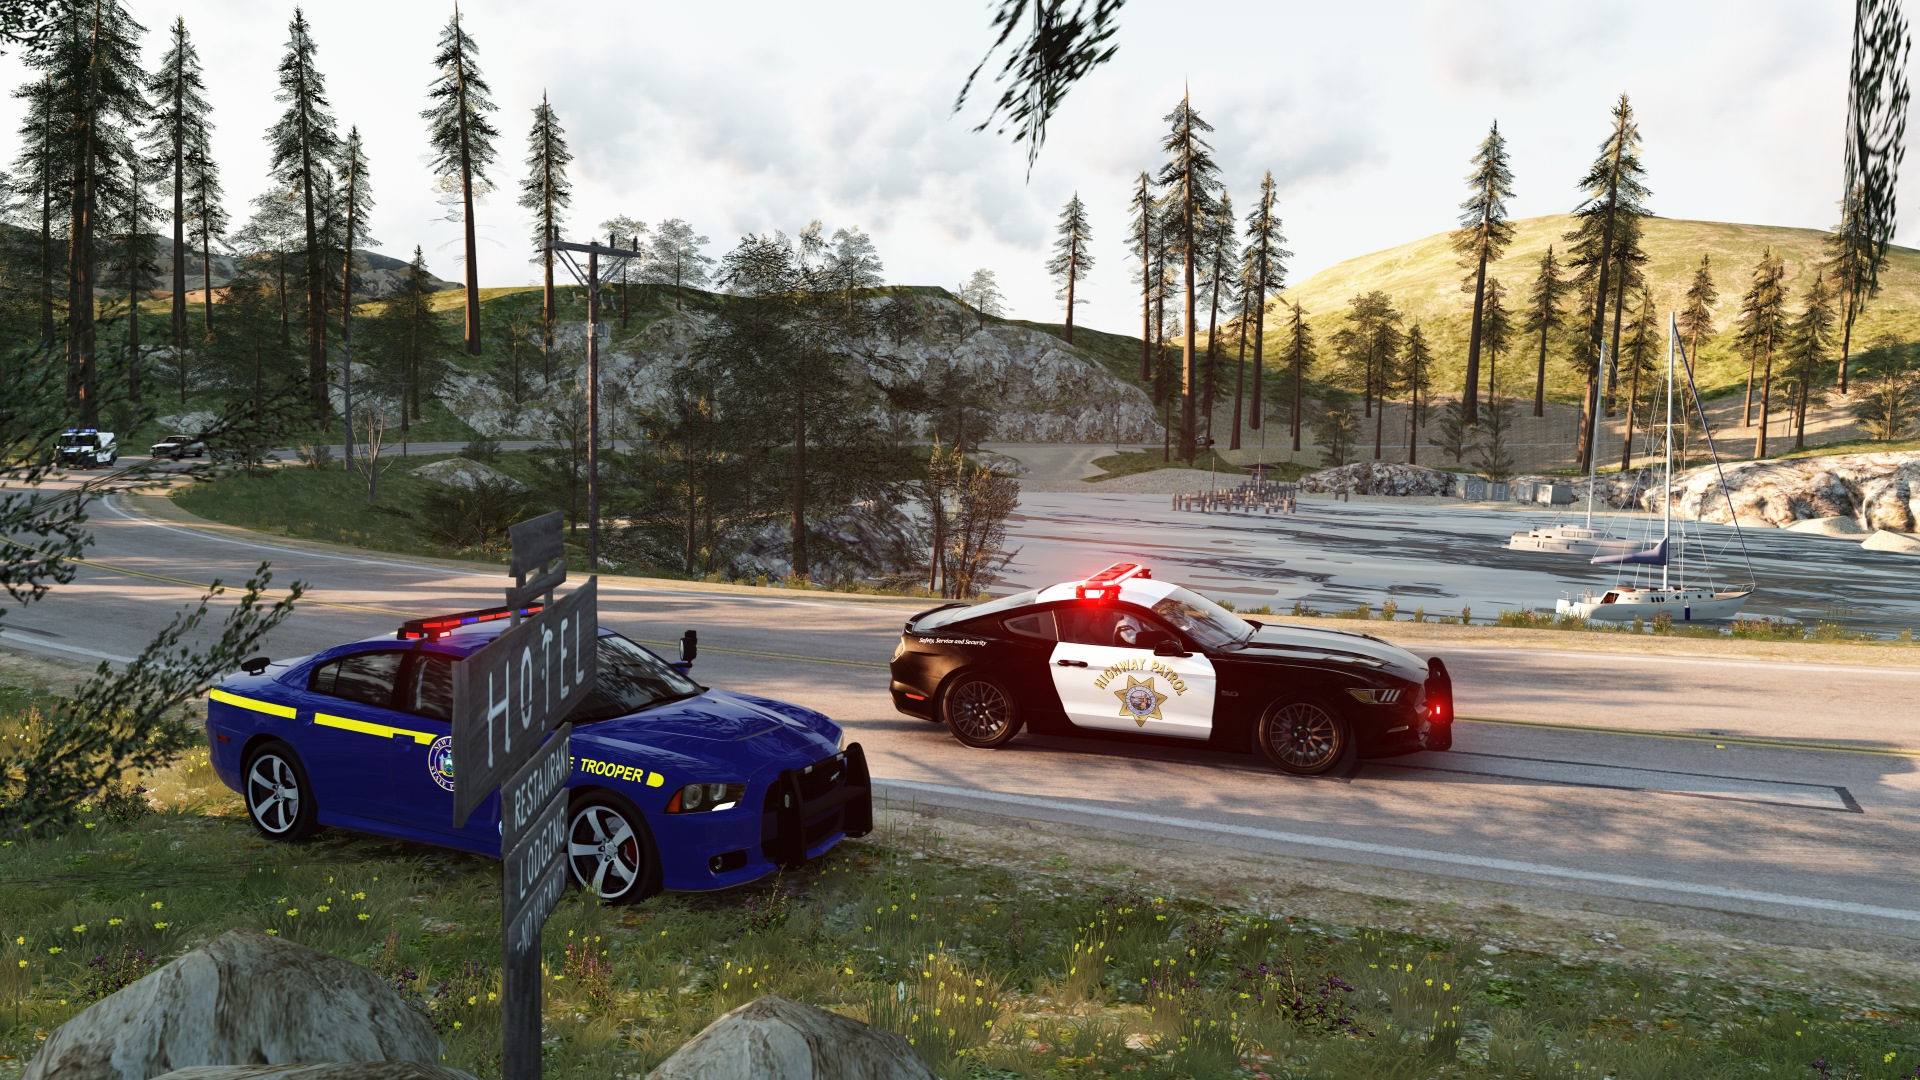 Screenshot_f_ford_mustang_police_californiacoast_6-6-121-18-32-39.jpg